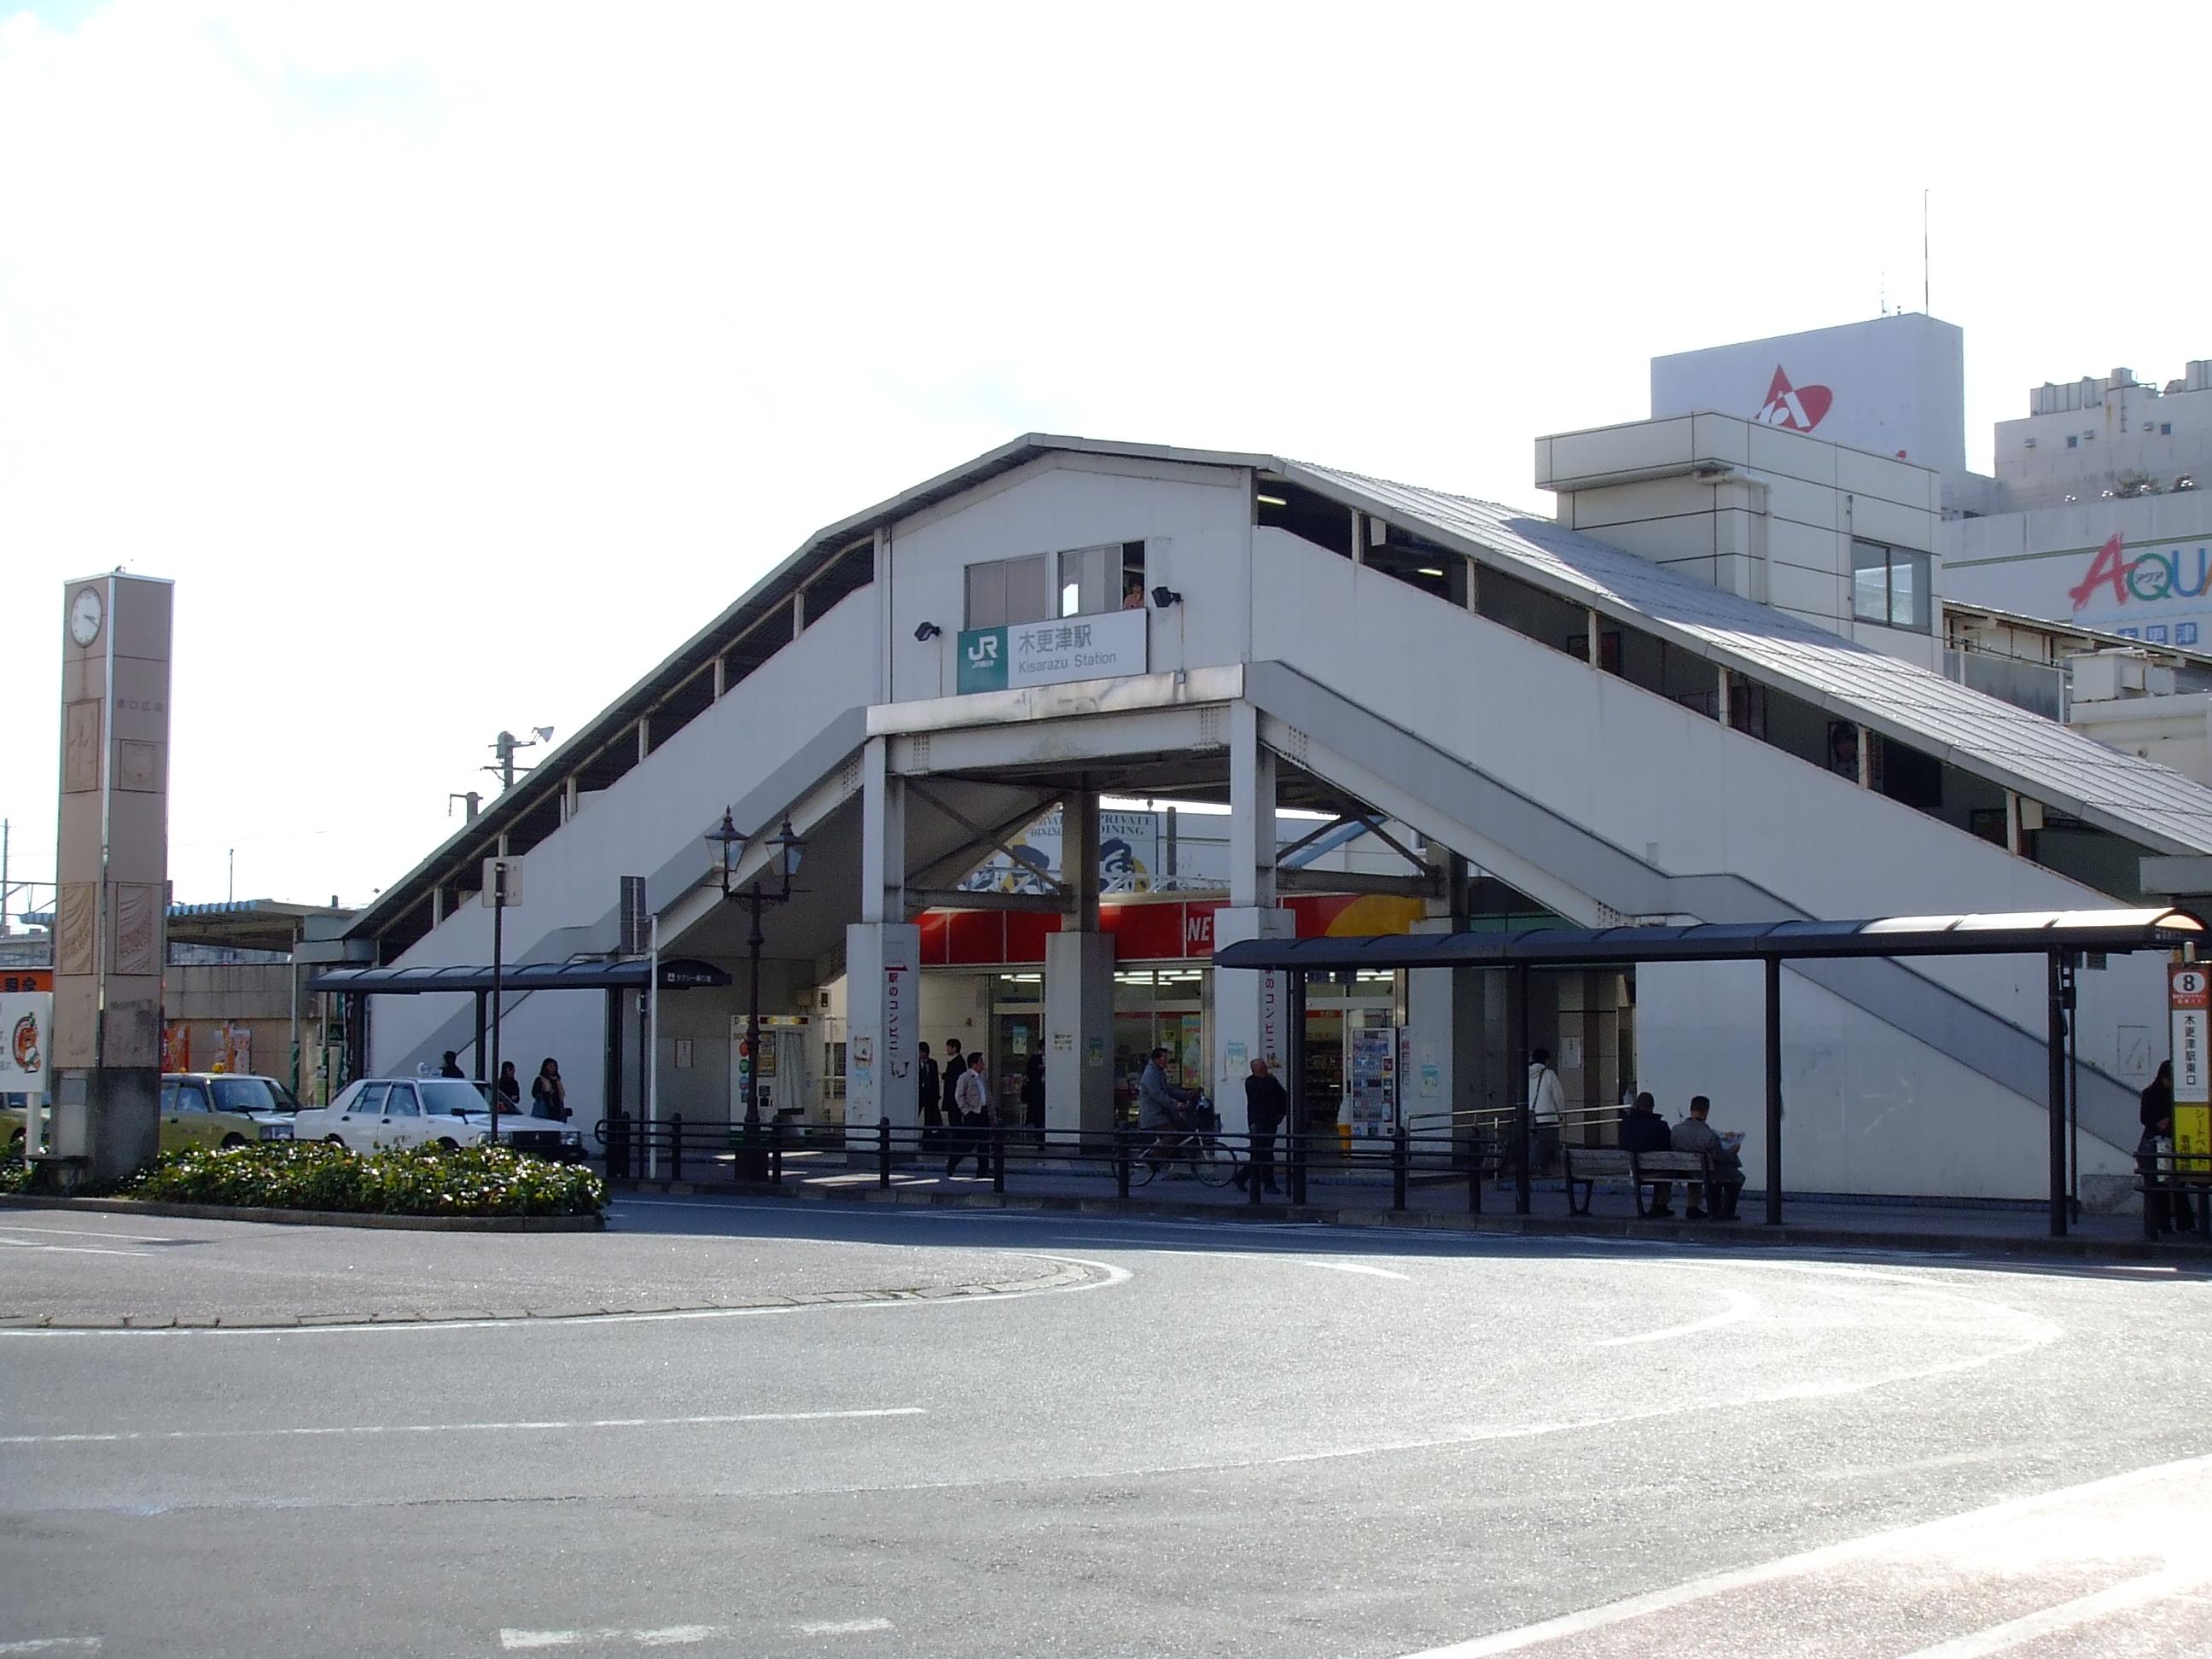 https://upload.wikimedia.org/wikipedia/commons/0/01/Kisarazu_008.JPG